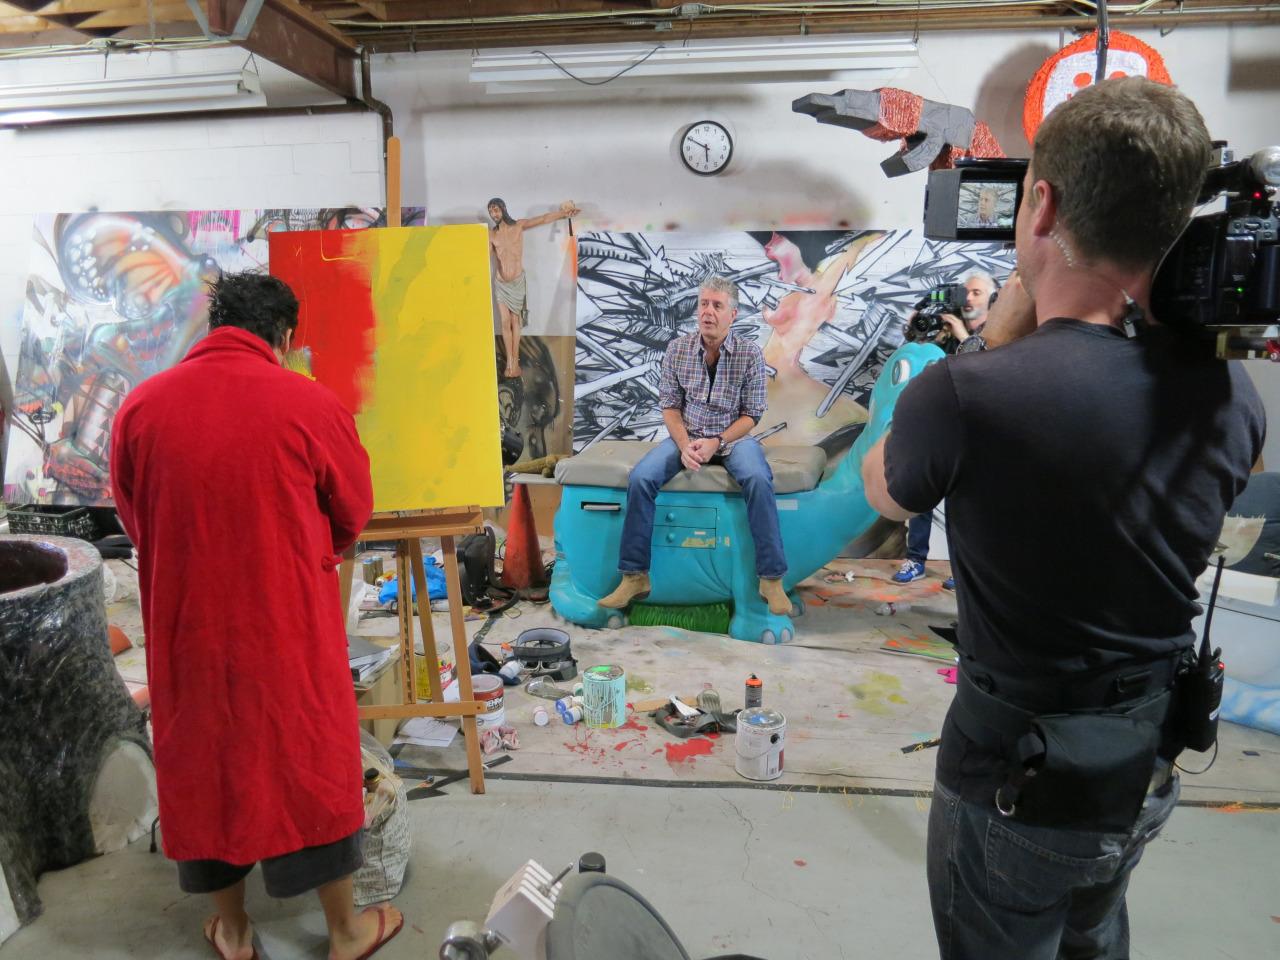 David-Choe-Antony-Bourdains-new-show-09